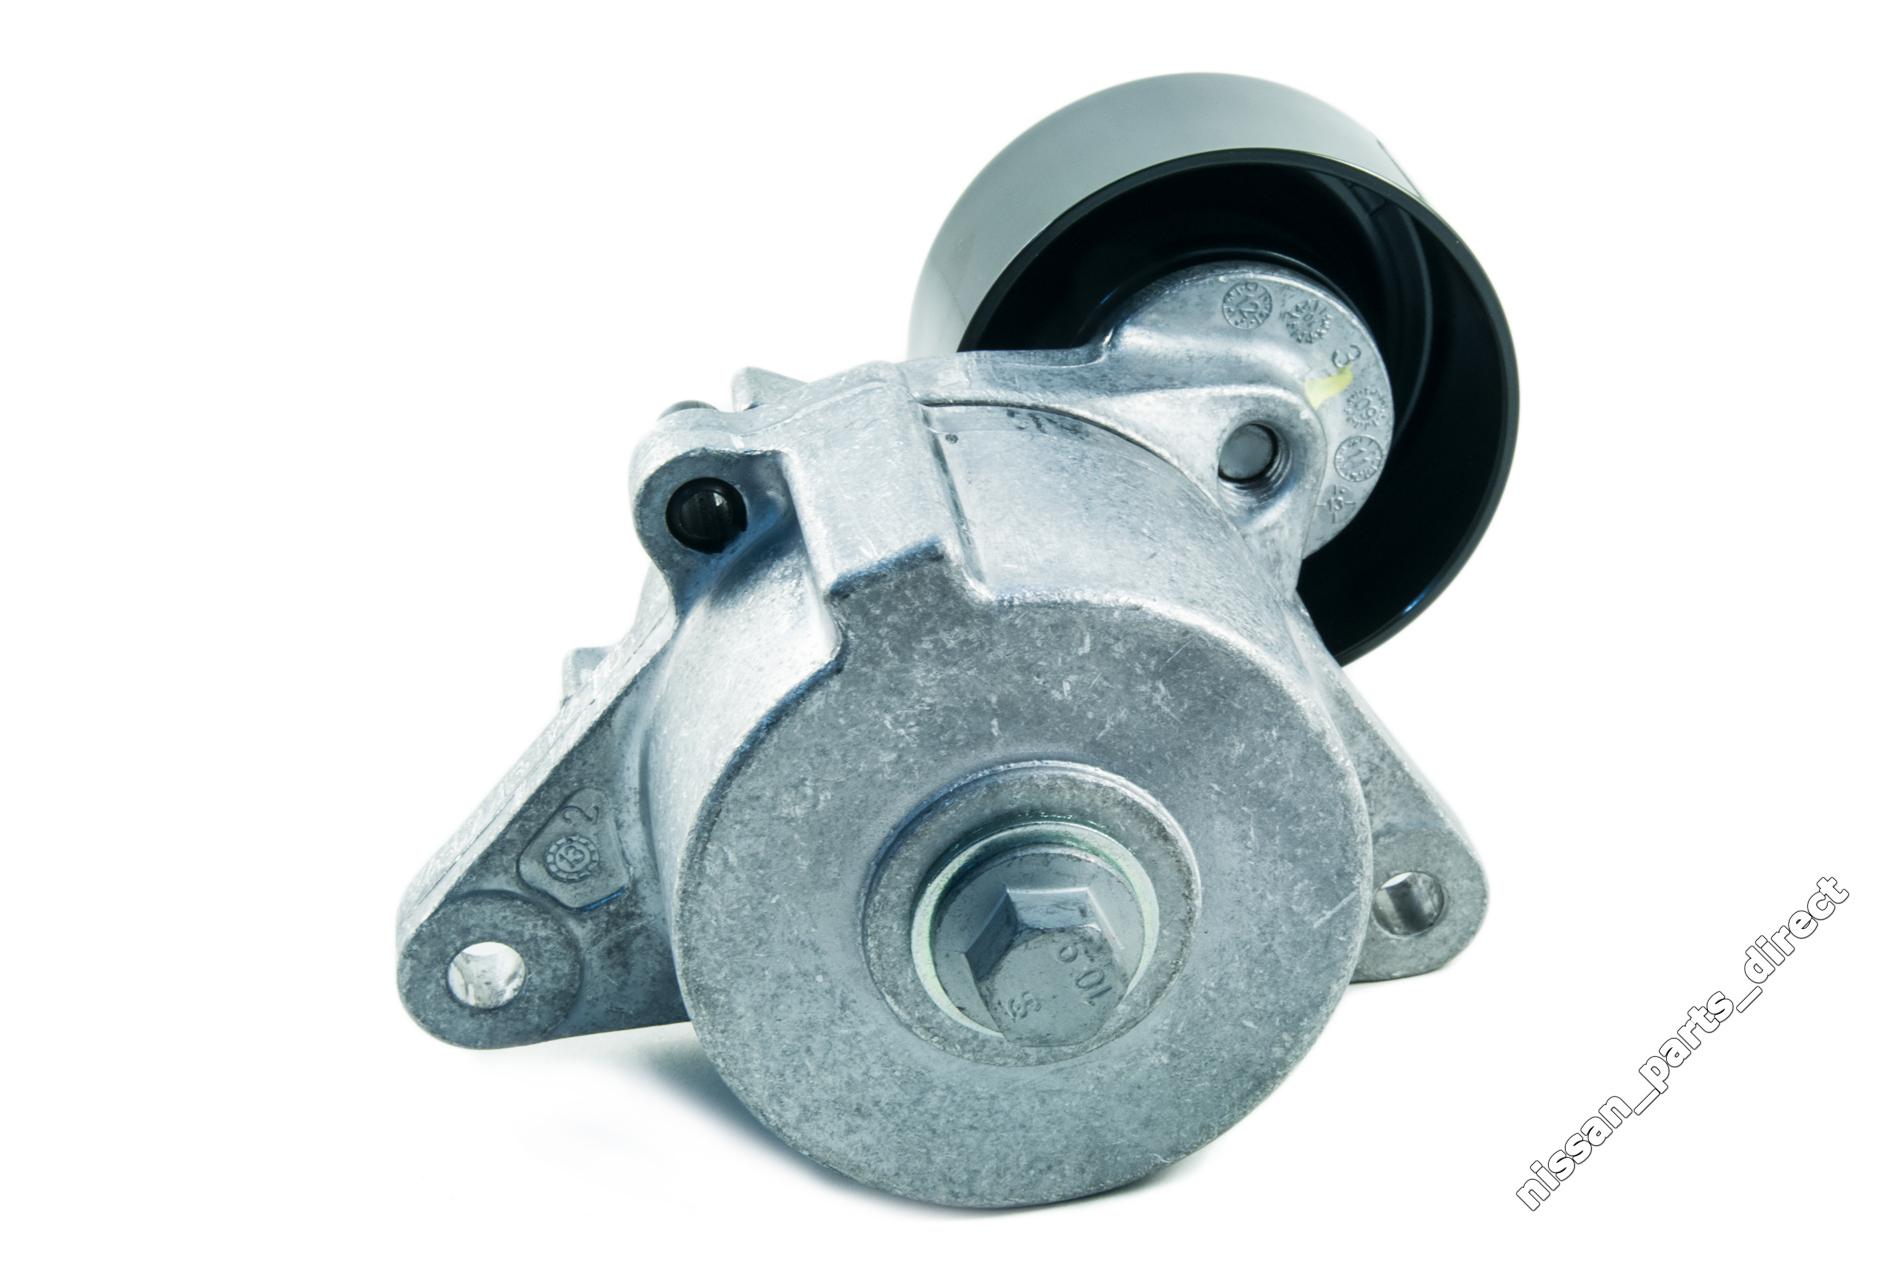 Nissan Genuine Navara D40 Timing Chain Cam Belt Tensioner Honda Online Store 1999 Crv Camshaft Parts 119555x00e